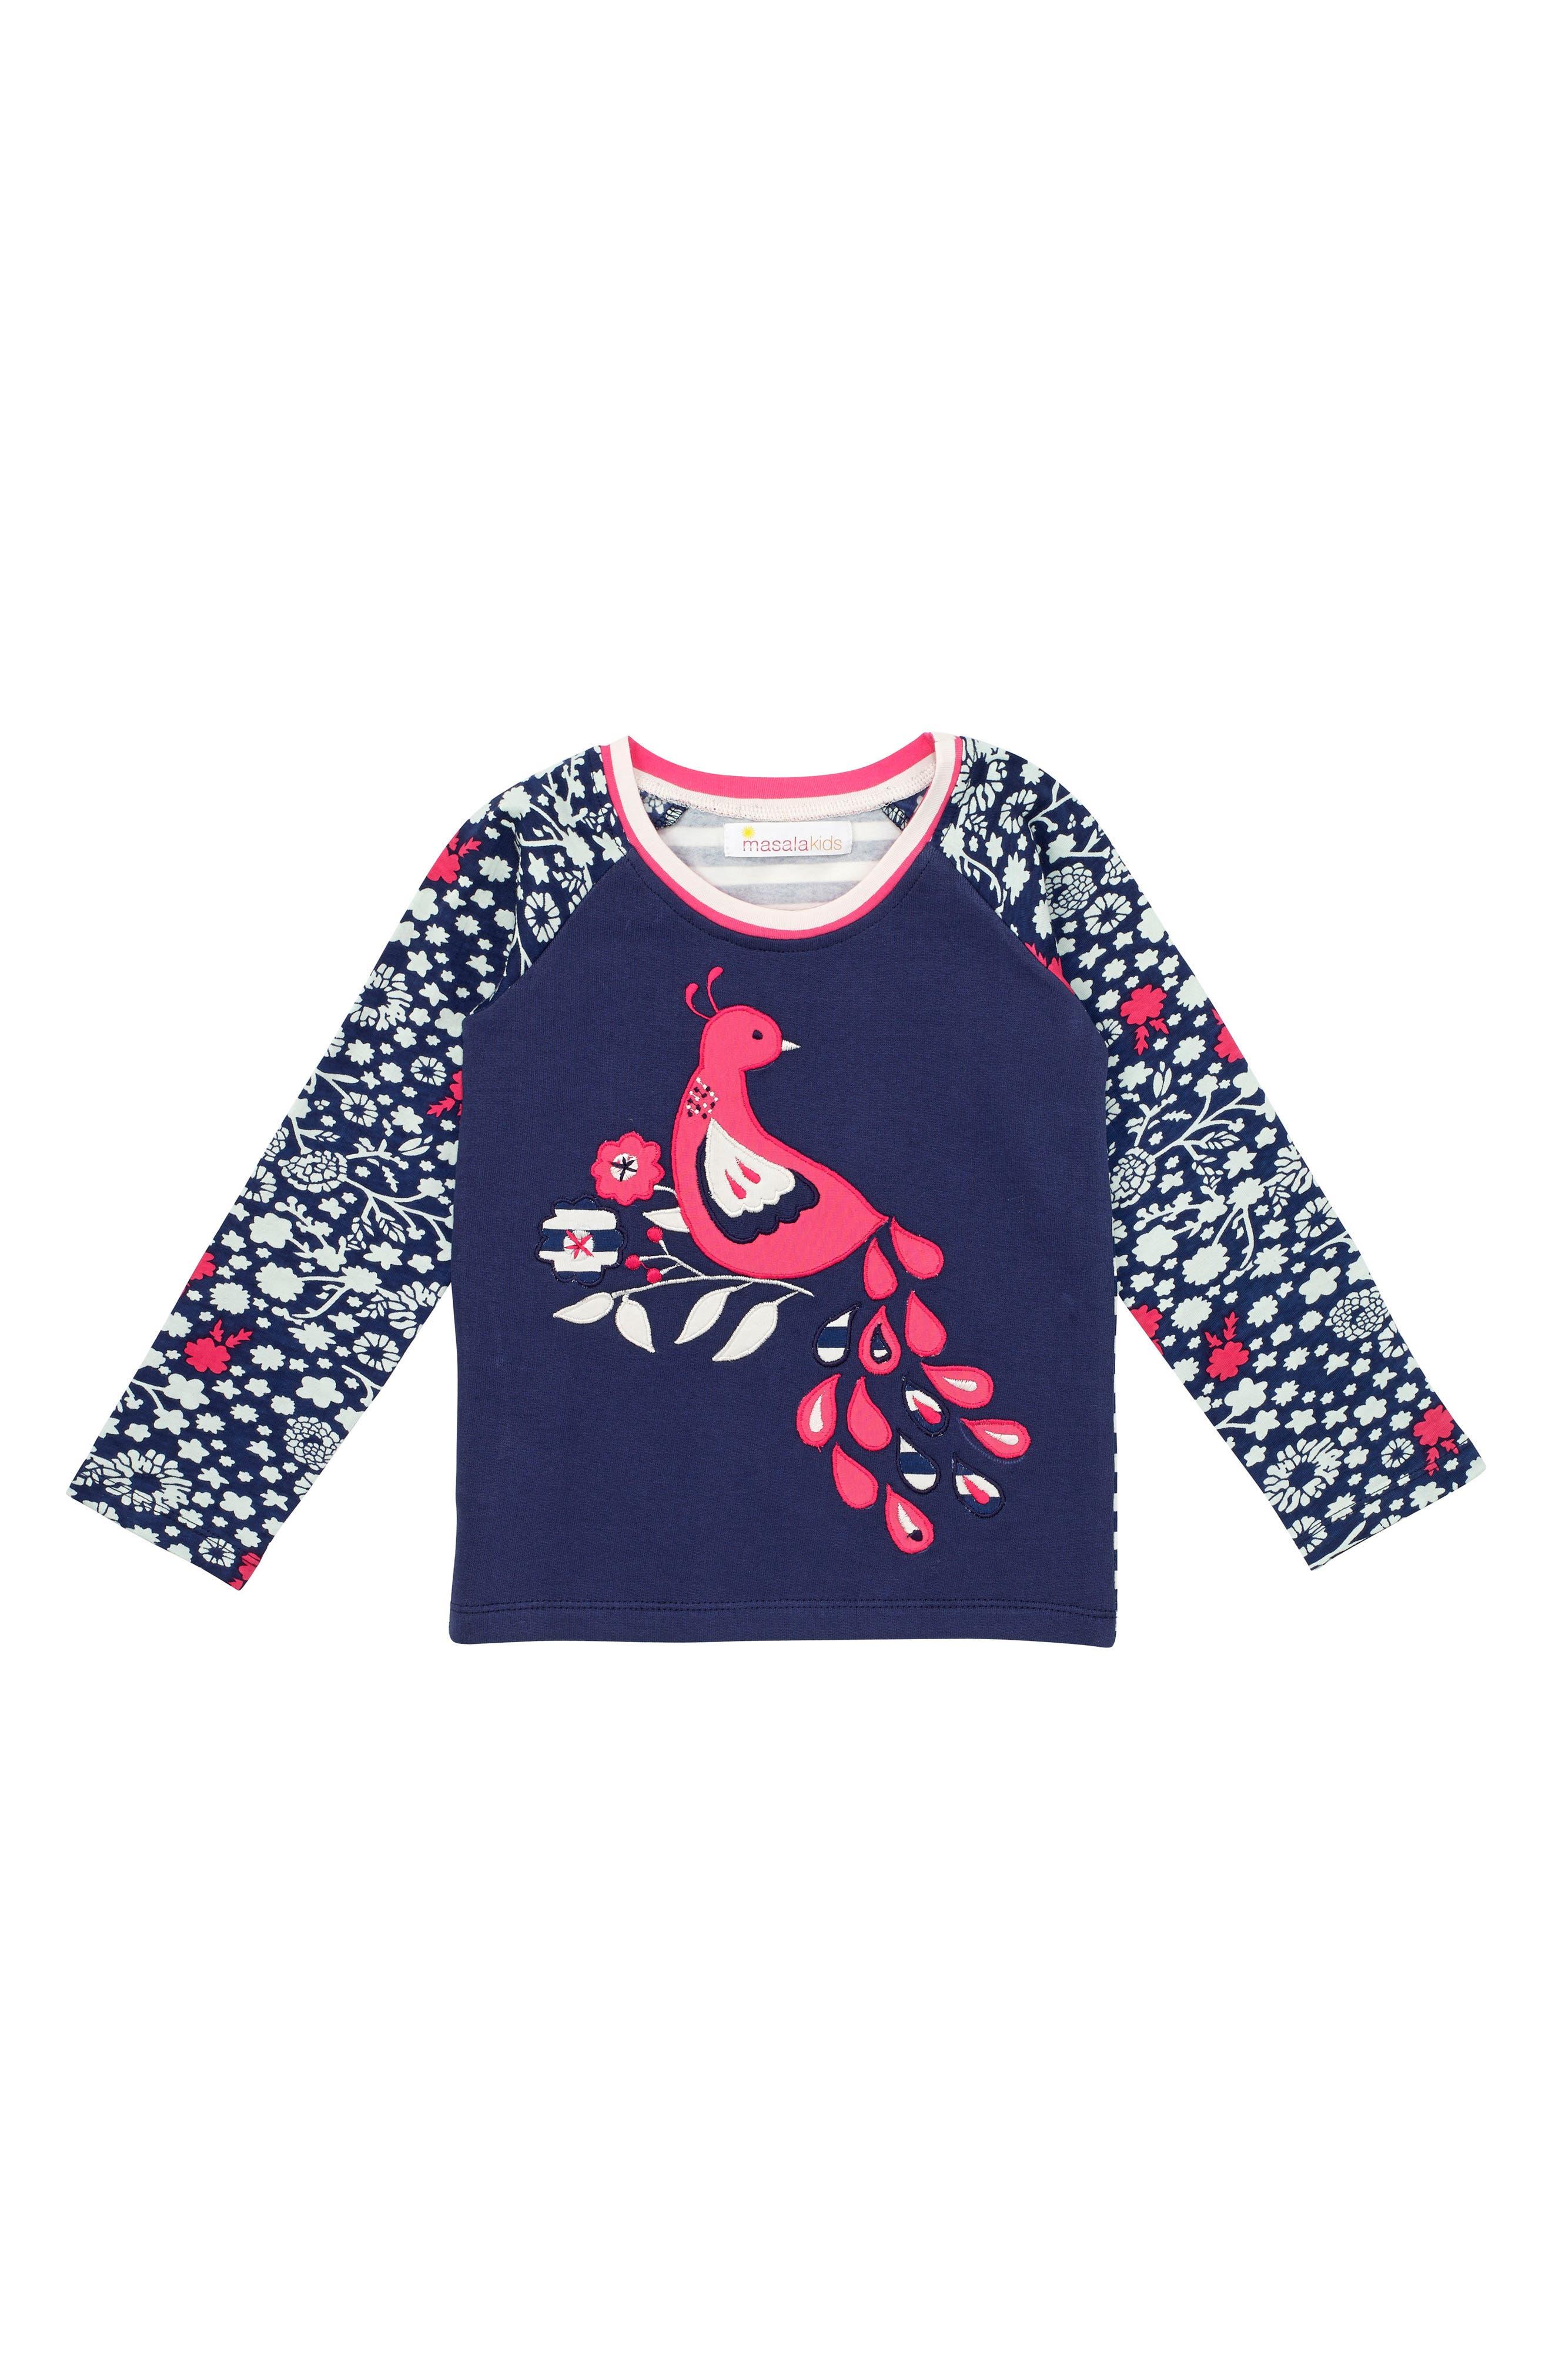 Alternate Image 1 Selected - Masasla Baby Dancing Peacock Appliqué Top (Toddler Girls, Little Girls & Big Girls)